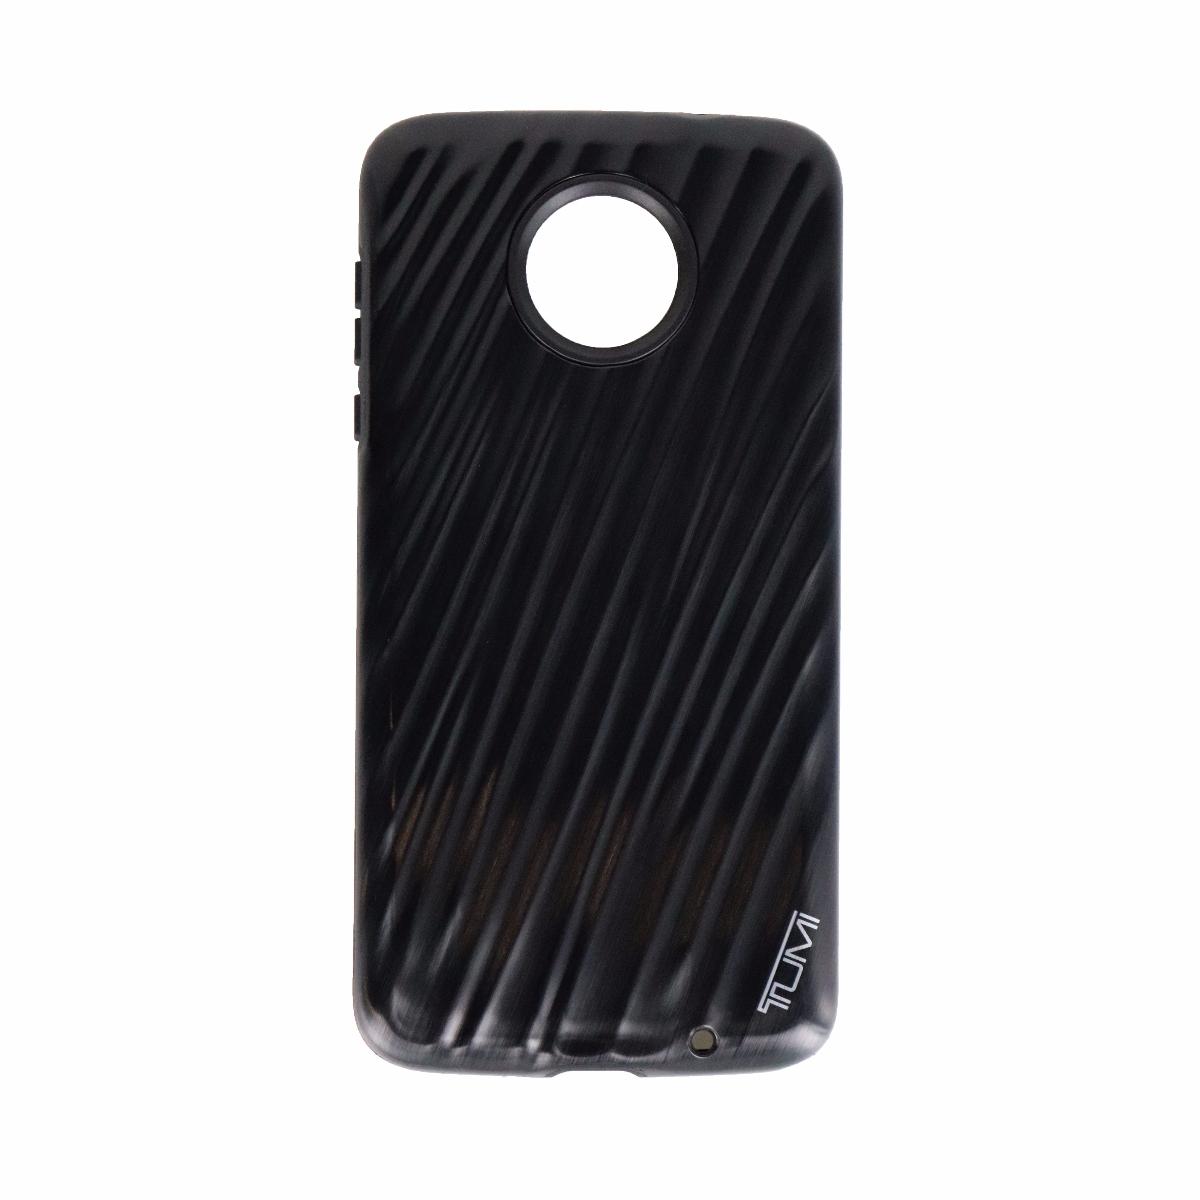 Tumi 19 Degree Series Hybrid Case Cover for Motorola Moto Z2 Force - Black